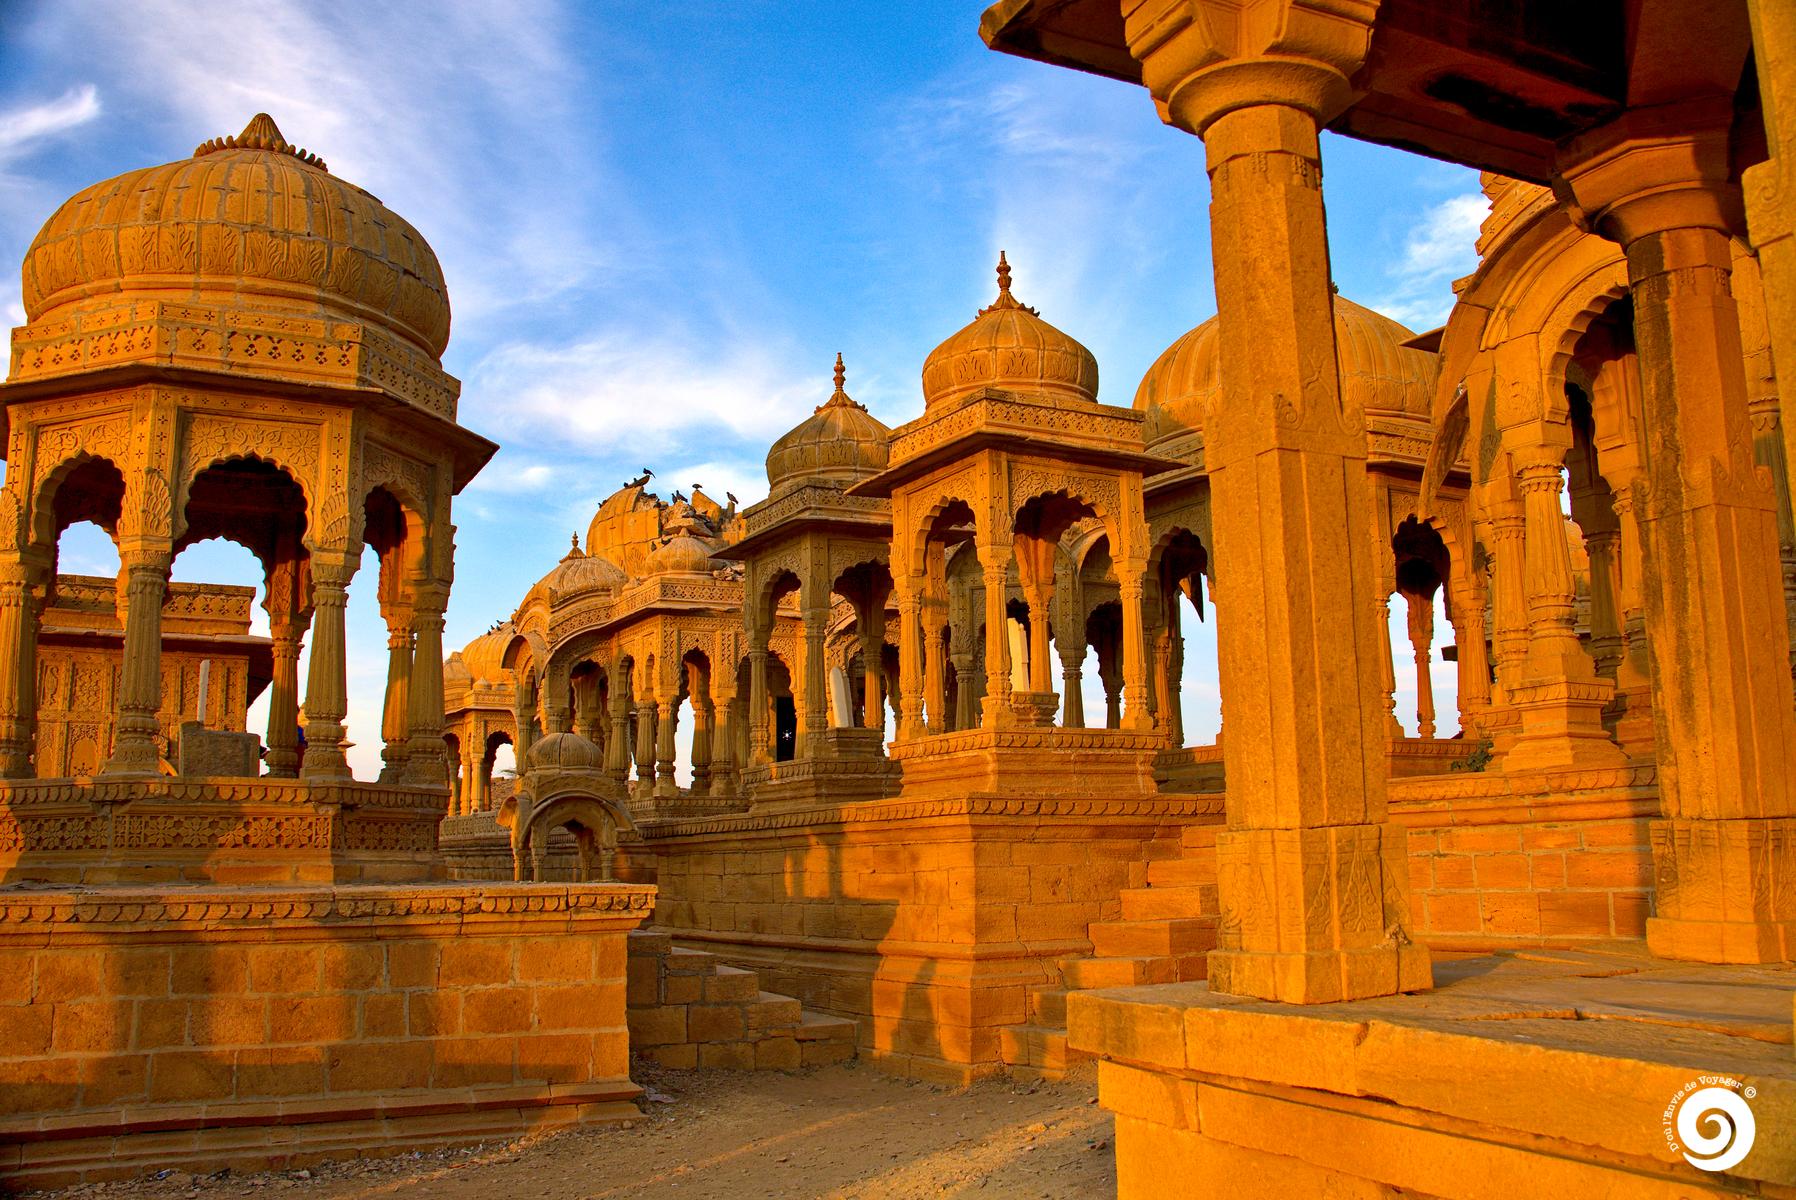 D'où l'Envie de Voyager - Inde - Jaisalmer